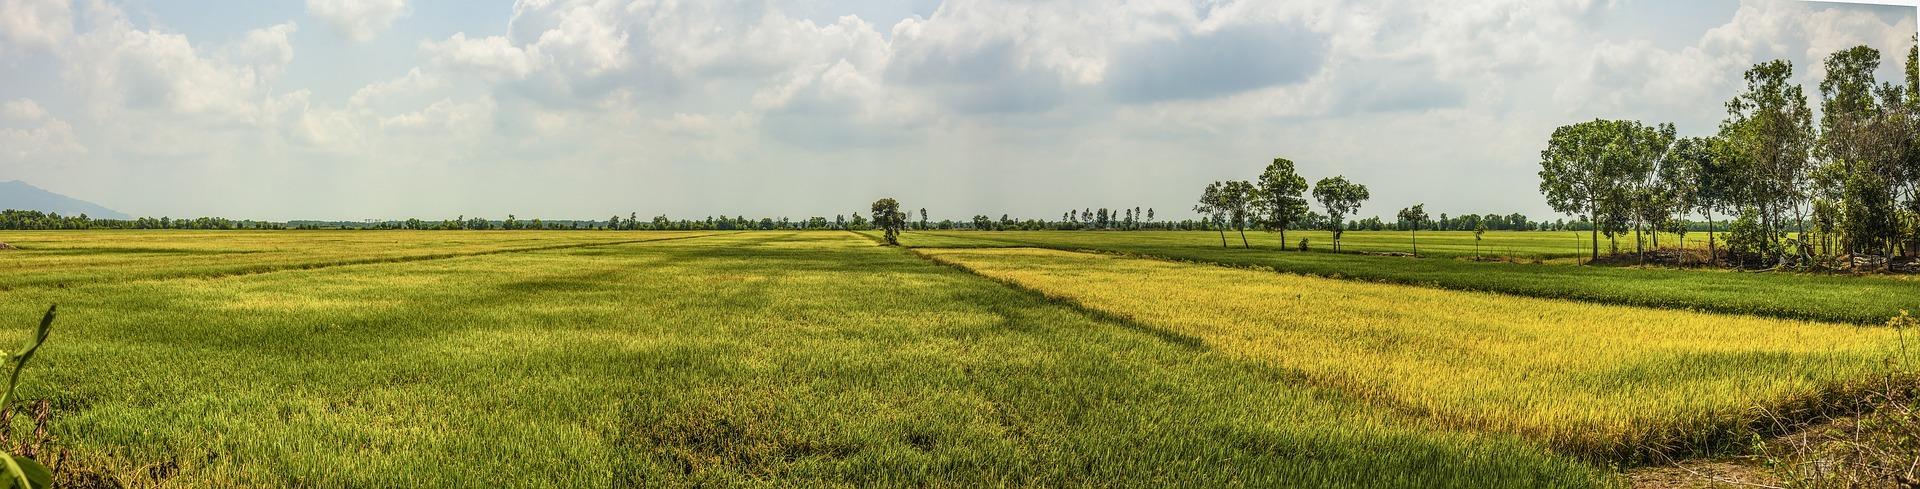 Mekong-deltaet